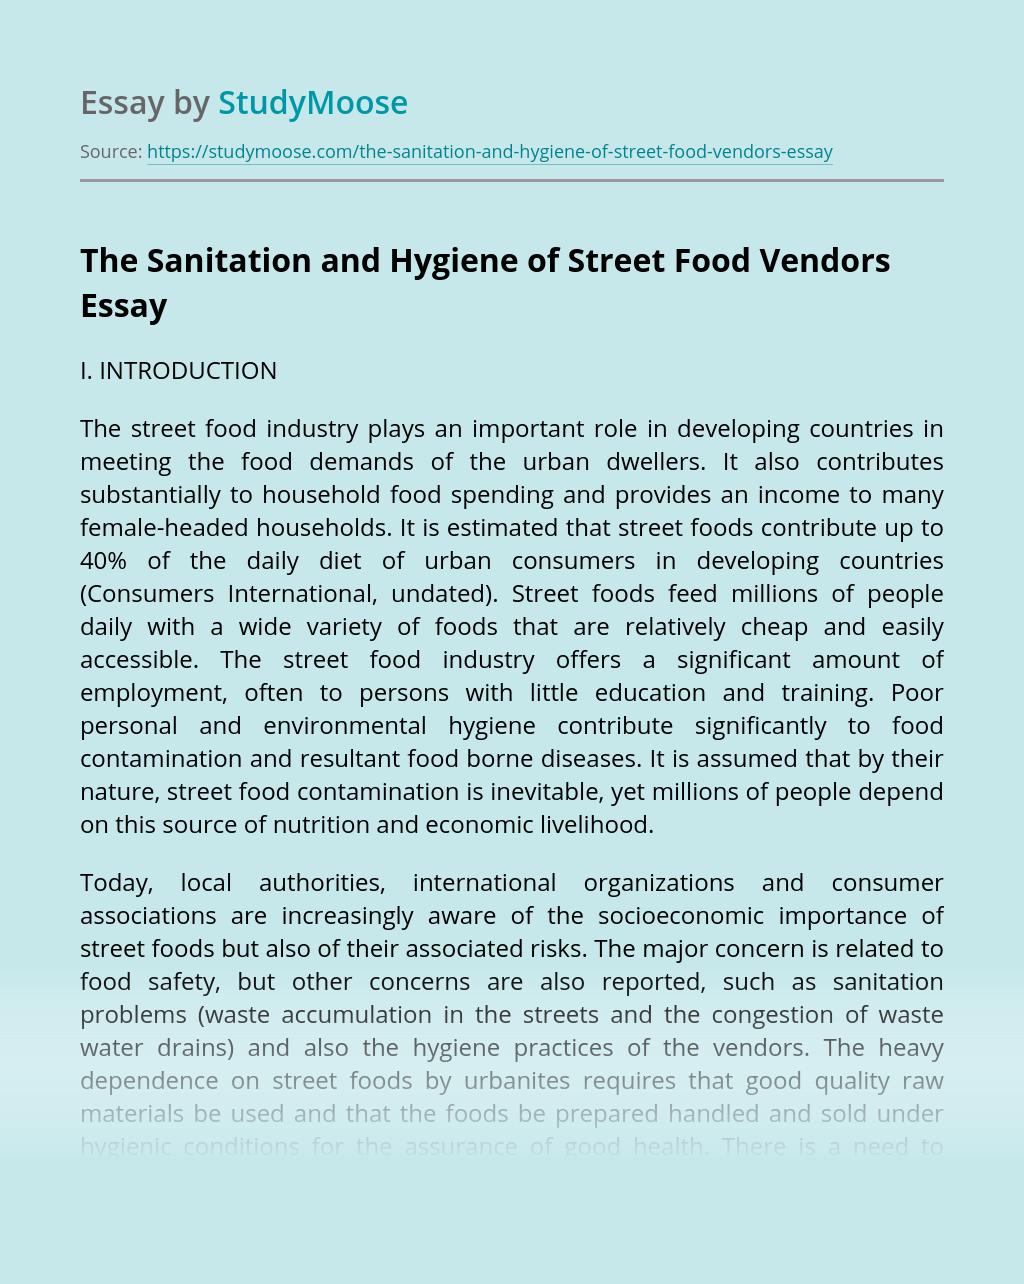 The Sanitation and Hygiene of Street Food Vendors